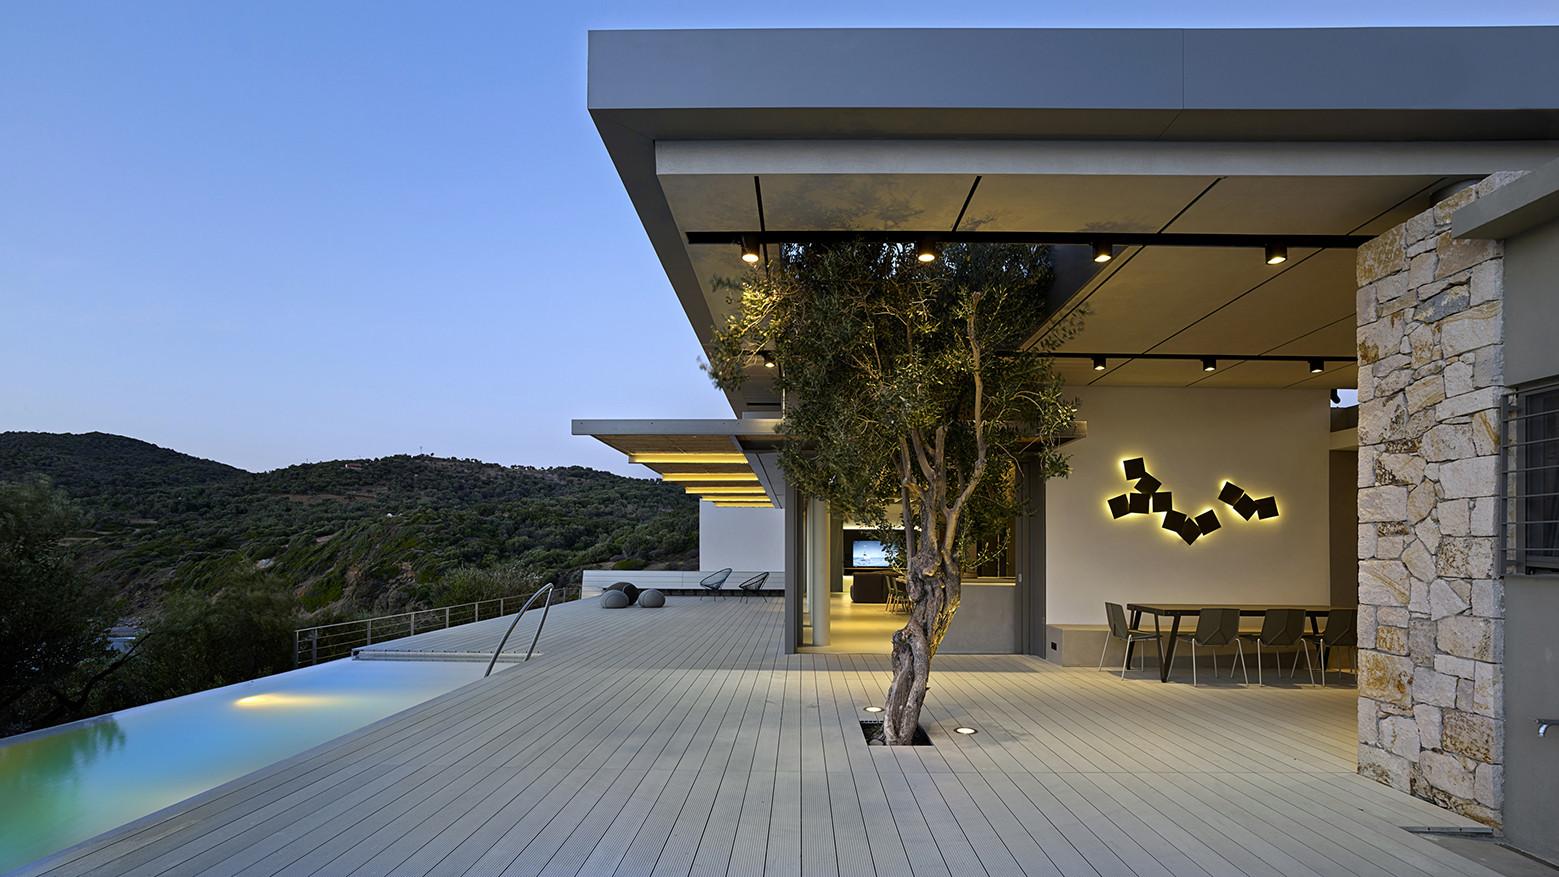 Notre Ntam' Lesvos Residences / Z-level, © Yiorgis Yerolybos